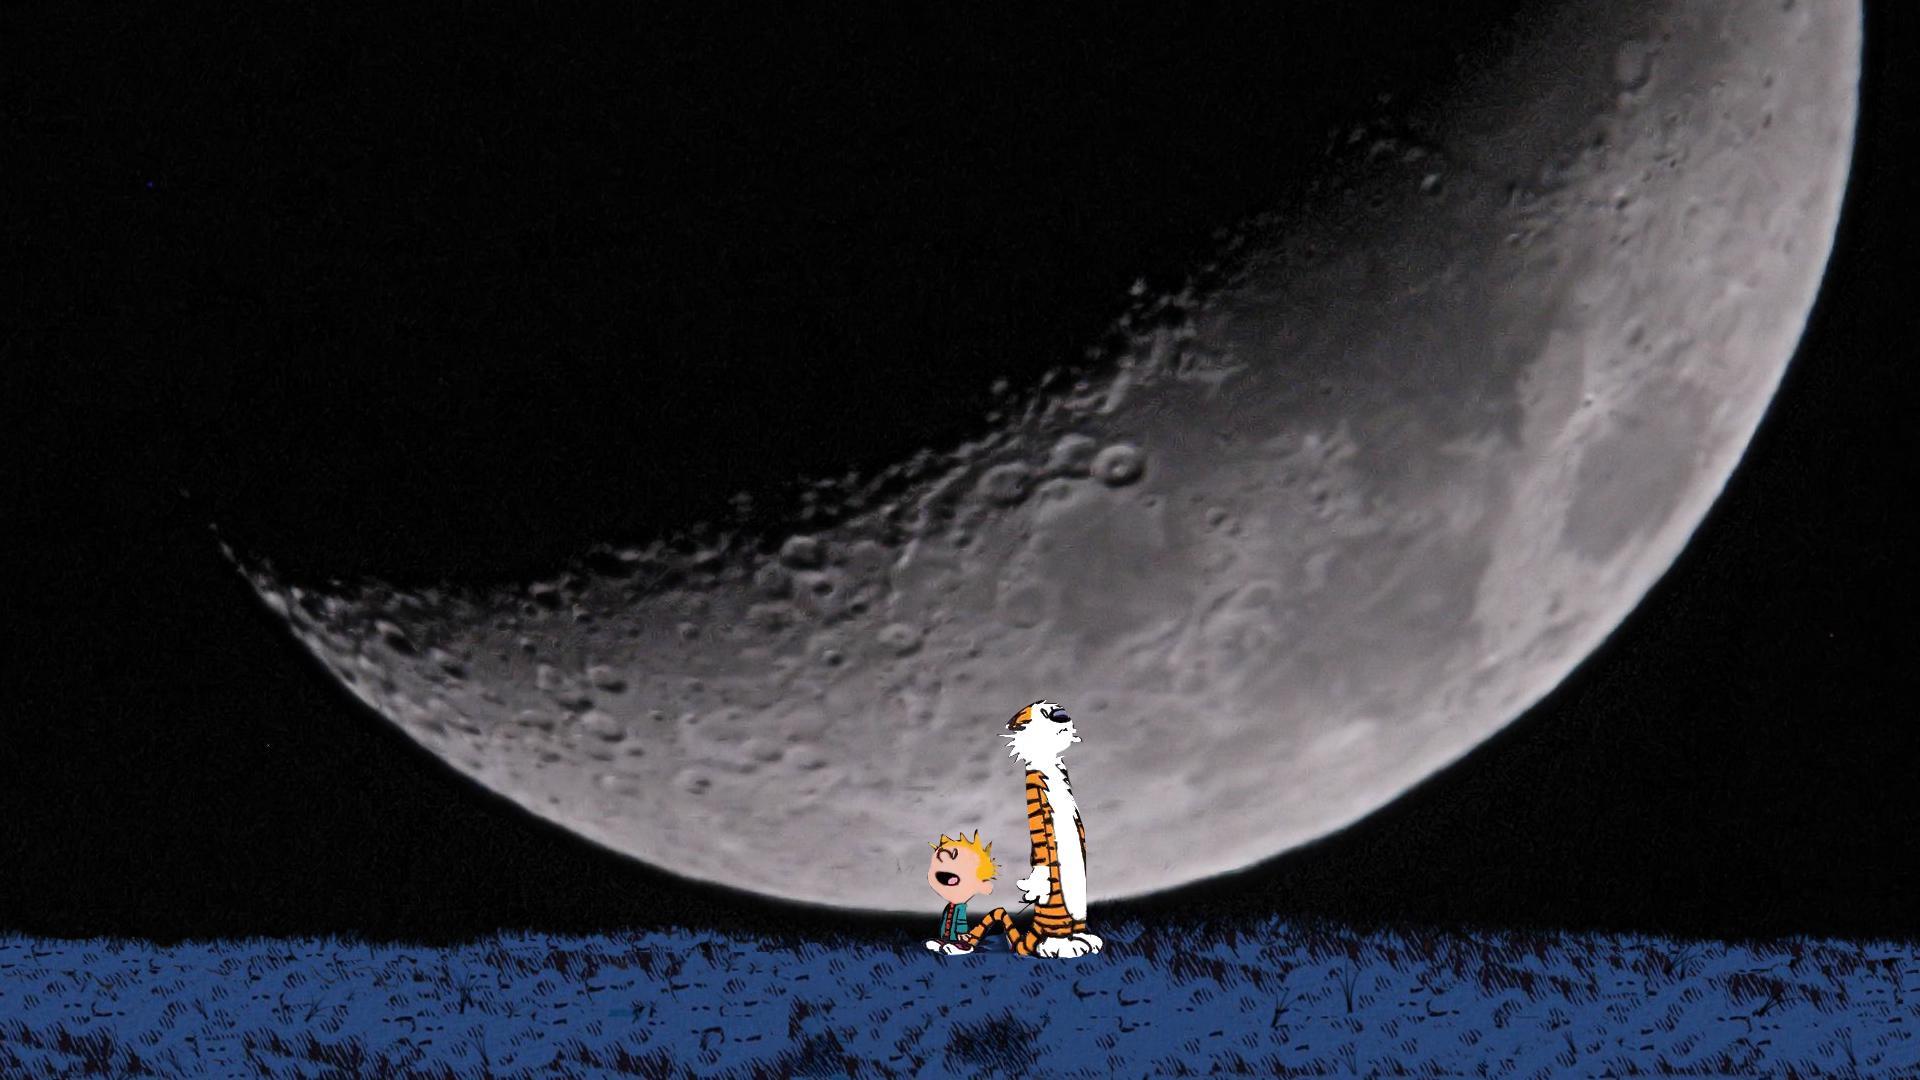 Calvin And Hobbes Comics Sci Fi Planet Sky Moon Mood F Wallpaper